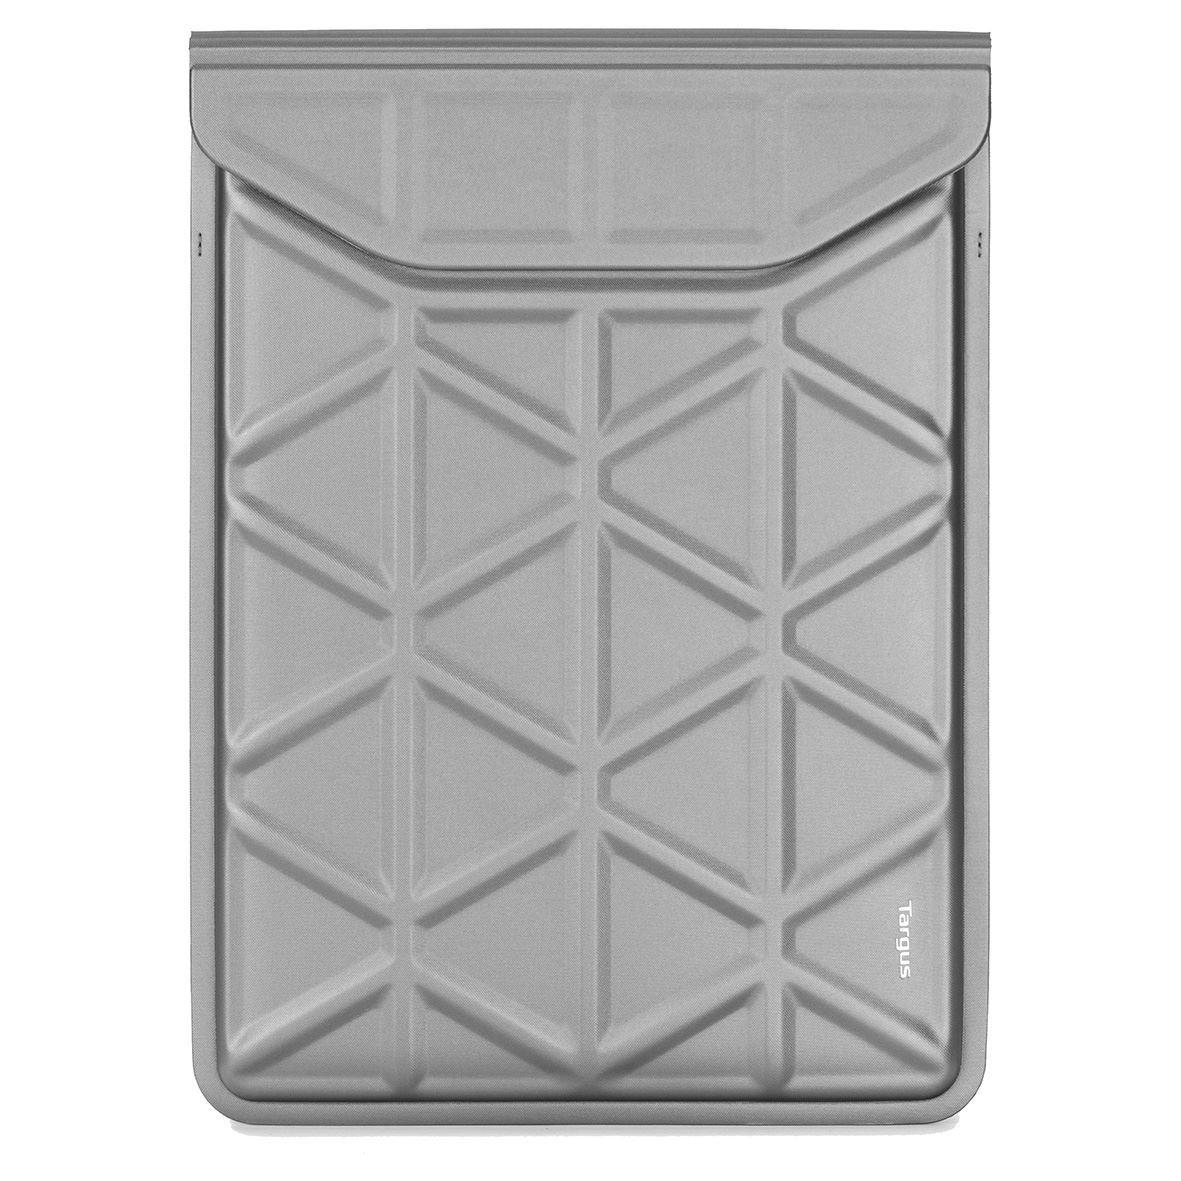 Husa Notebook Targus Pro-Tek 11.6 Argintiu title=Husa Notebook Targus Pro-Tek 11.6 Argintiu